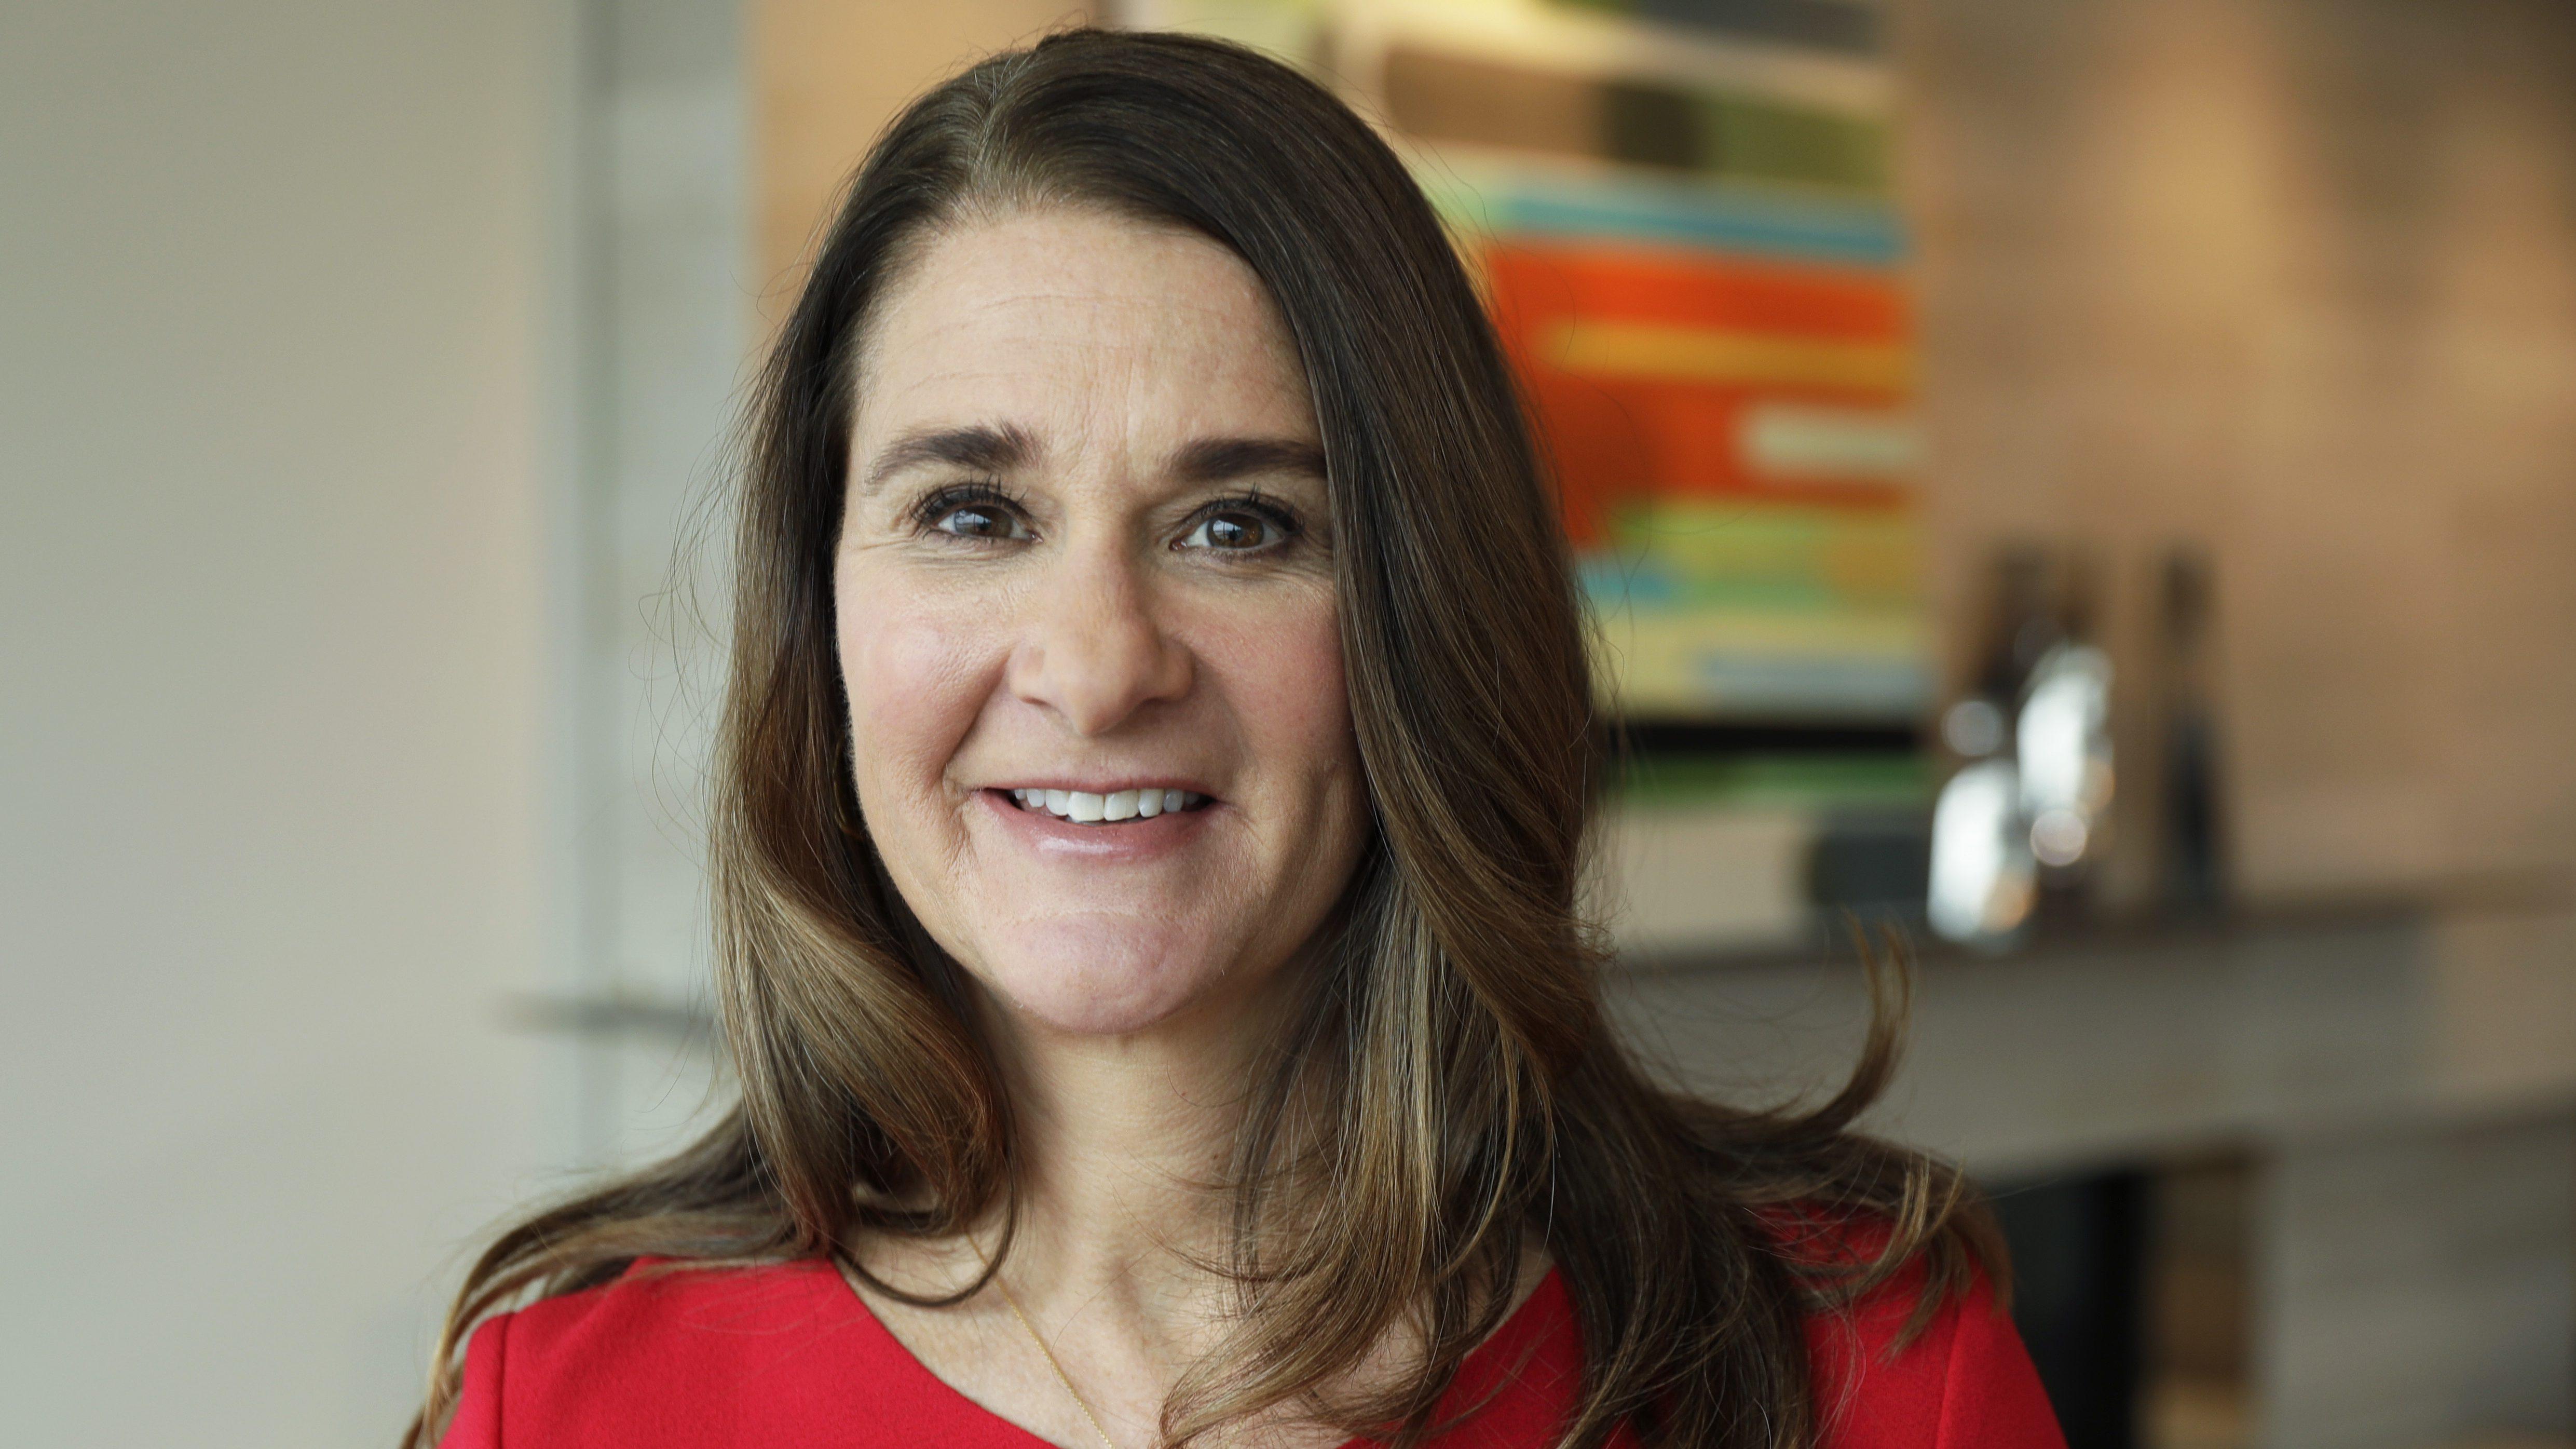 Melinda Gates I Spent My Career In >> Melinda Gates Op Ed When Money Flows Into The Hands Of Women